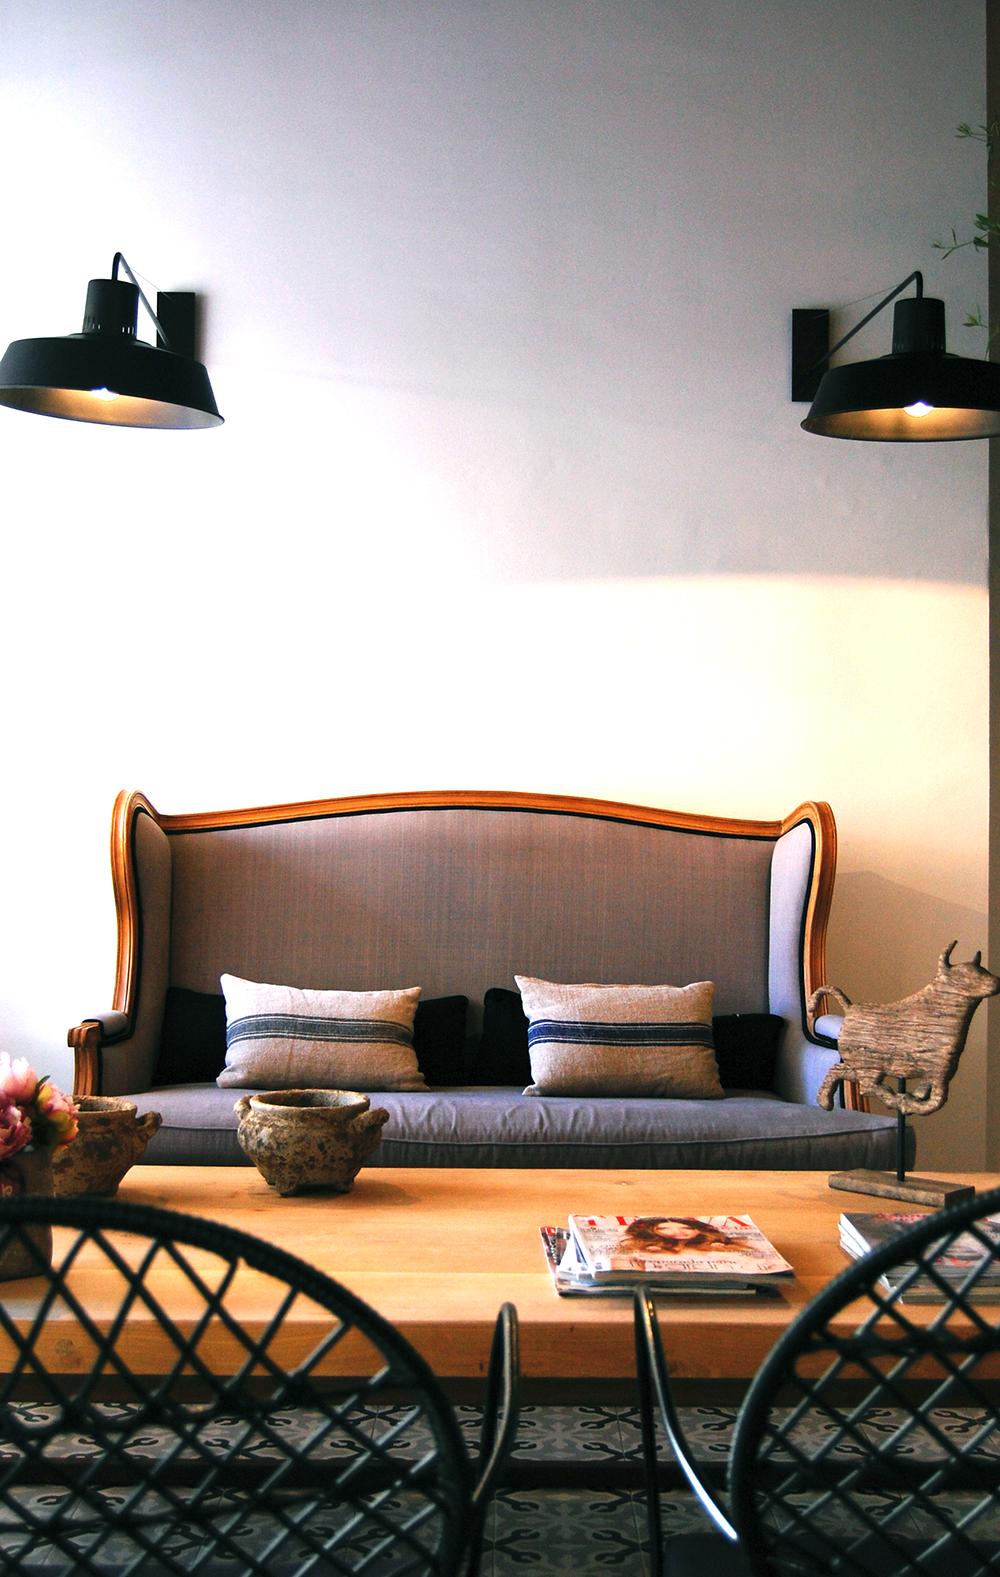 estilo retro aplicado a iluminacion de un espacio de lectura